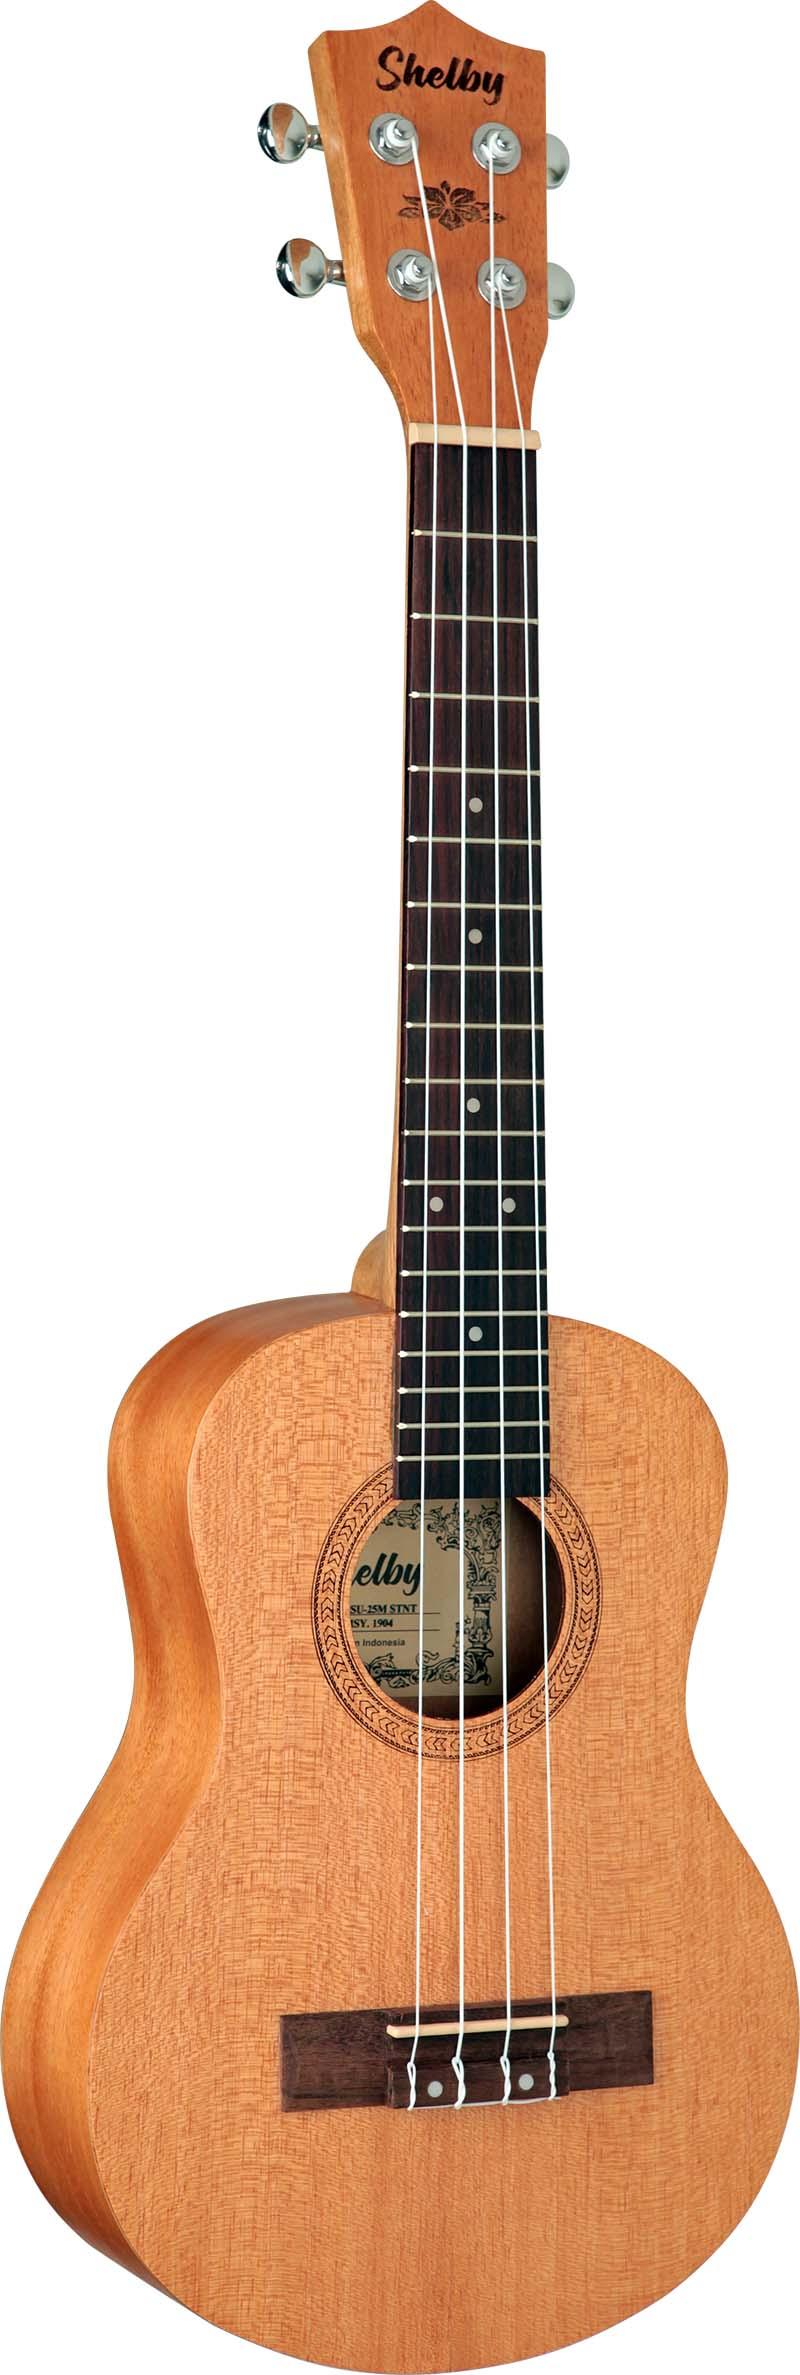 su25m ukulele tenor shelby su25m stnt mogno acetinado visao frontal 1